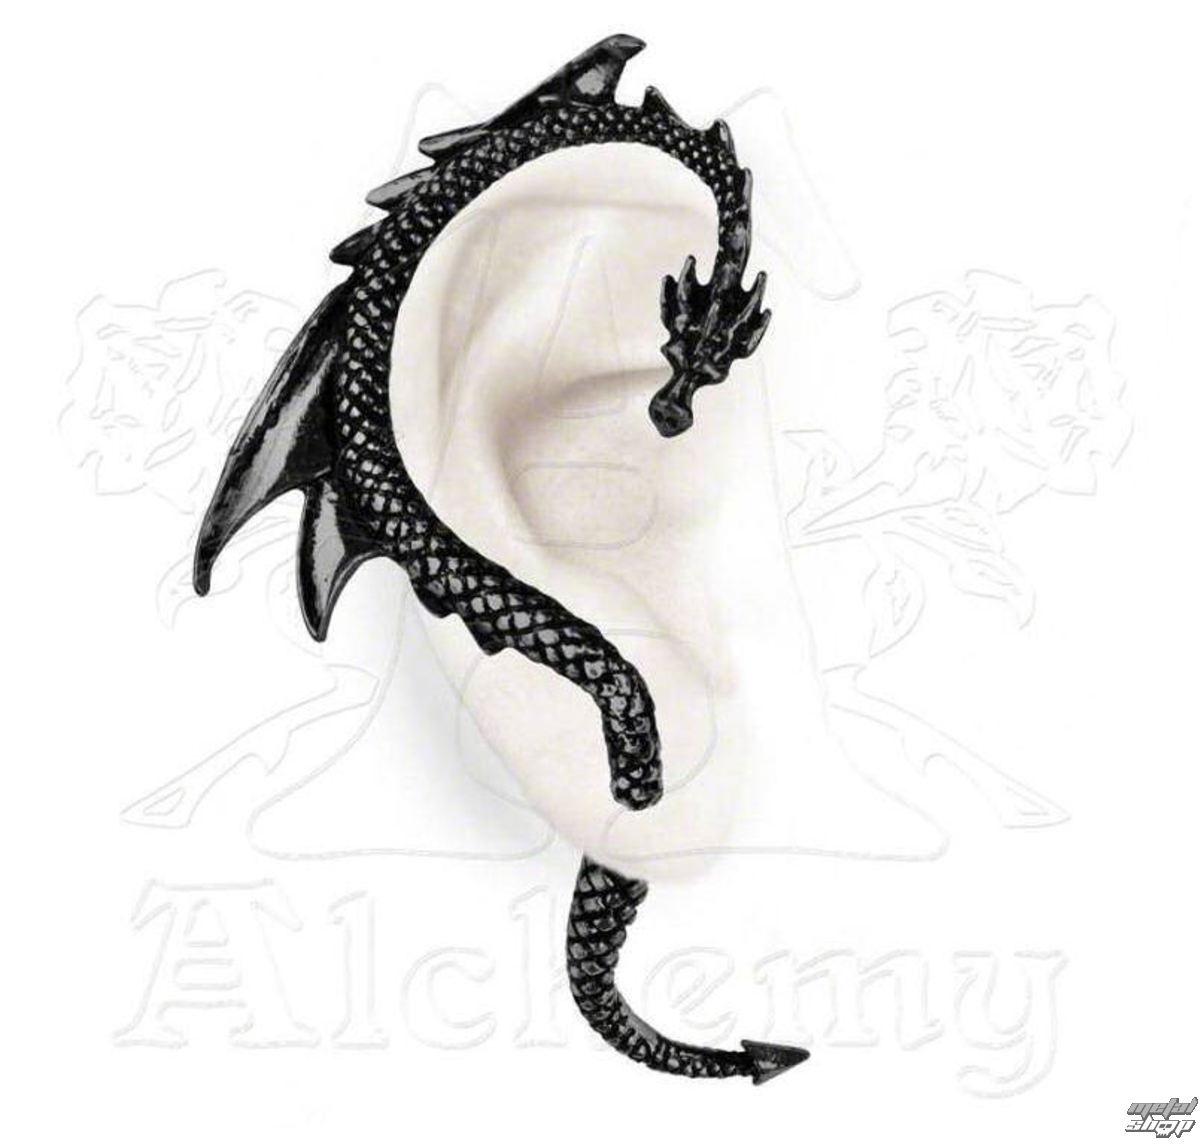 náušnice The Dragon's Lure - Black - ALCHEMY GOTHIC - E274B